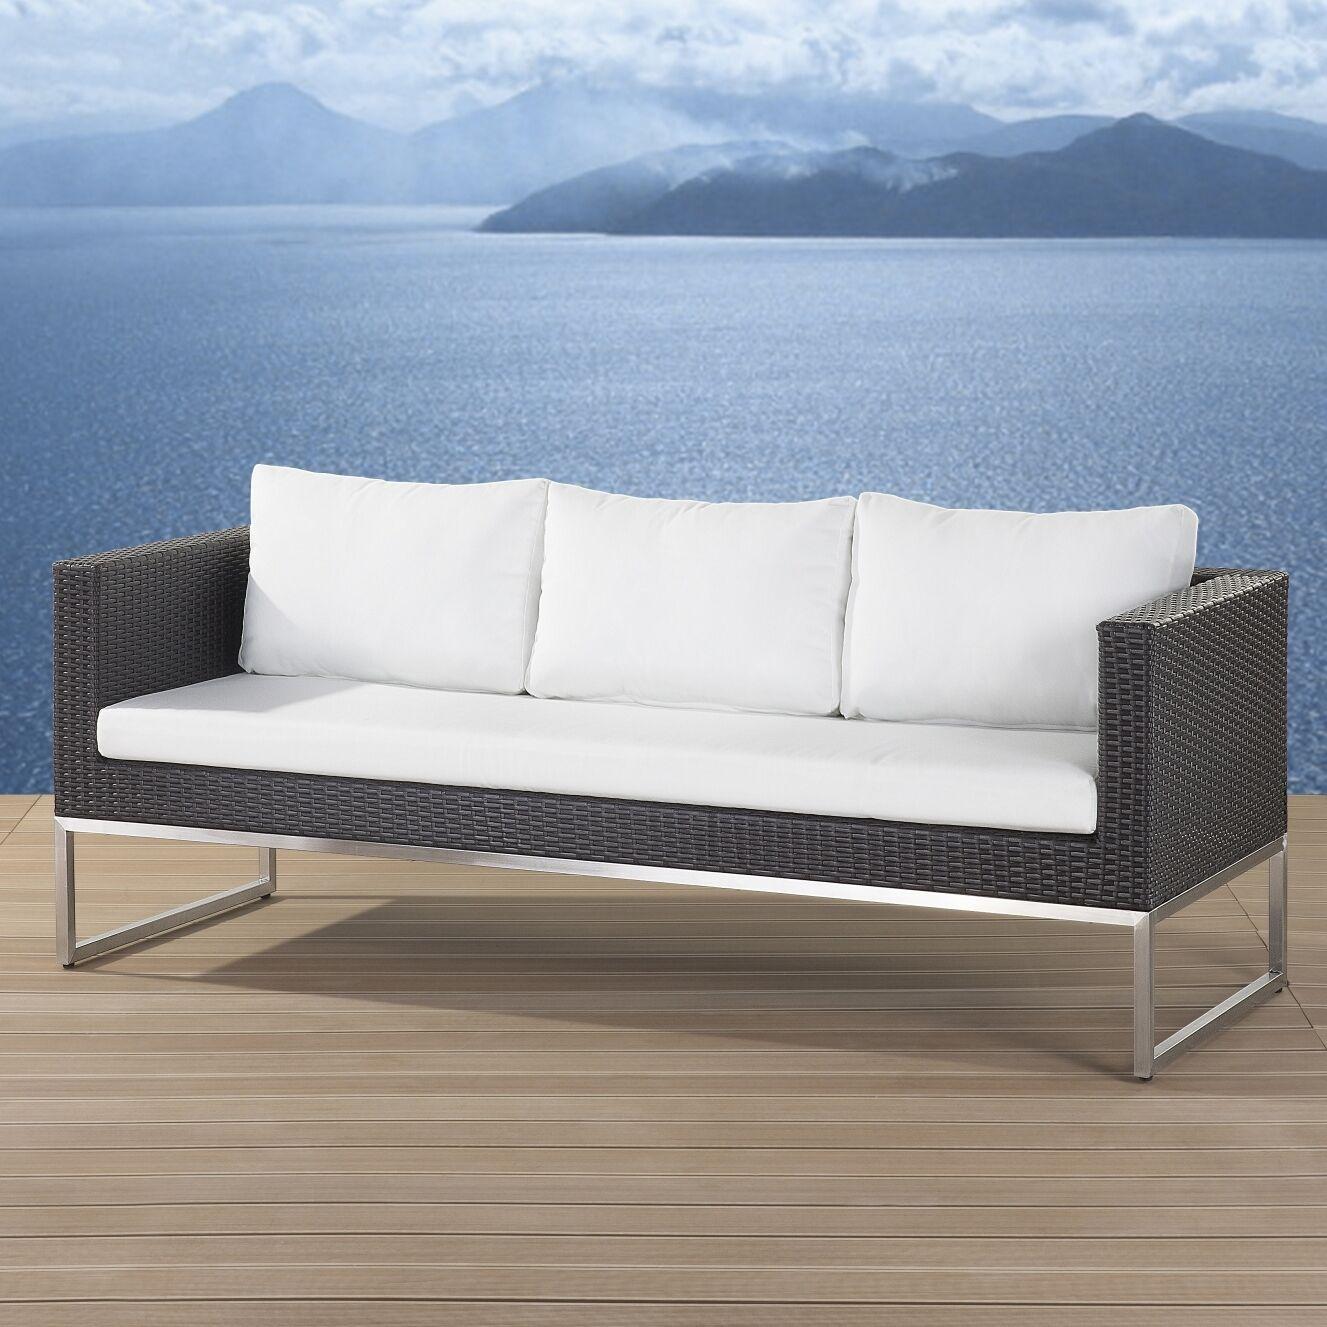 Mattis Sofa with Cushions Finish: Brown